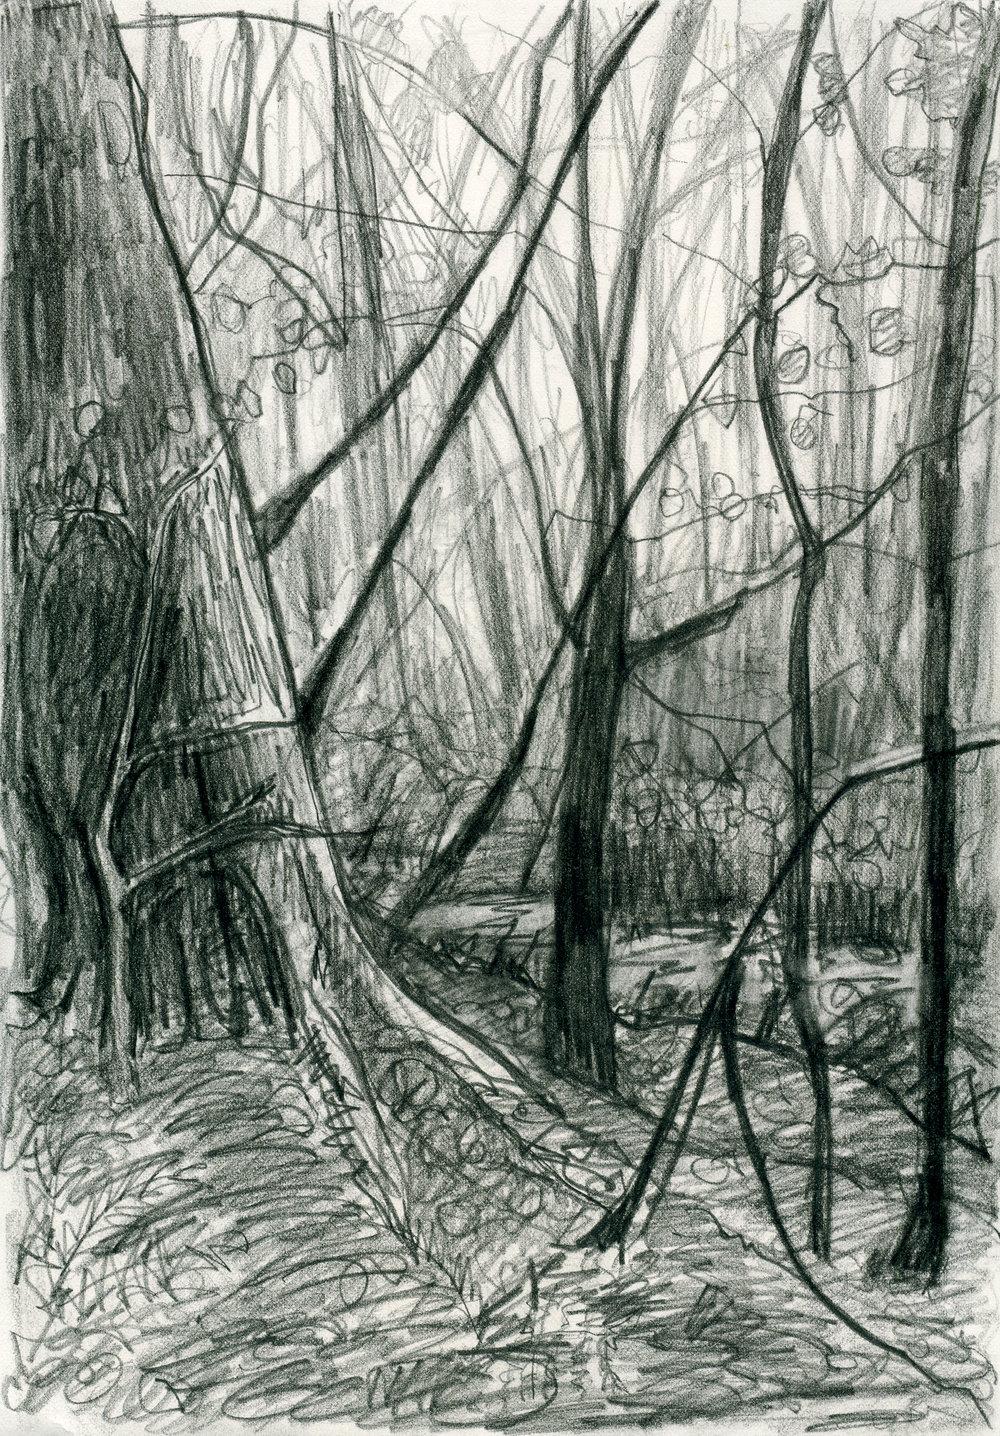 treesketchpencil002web.jpg